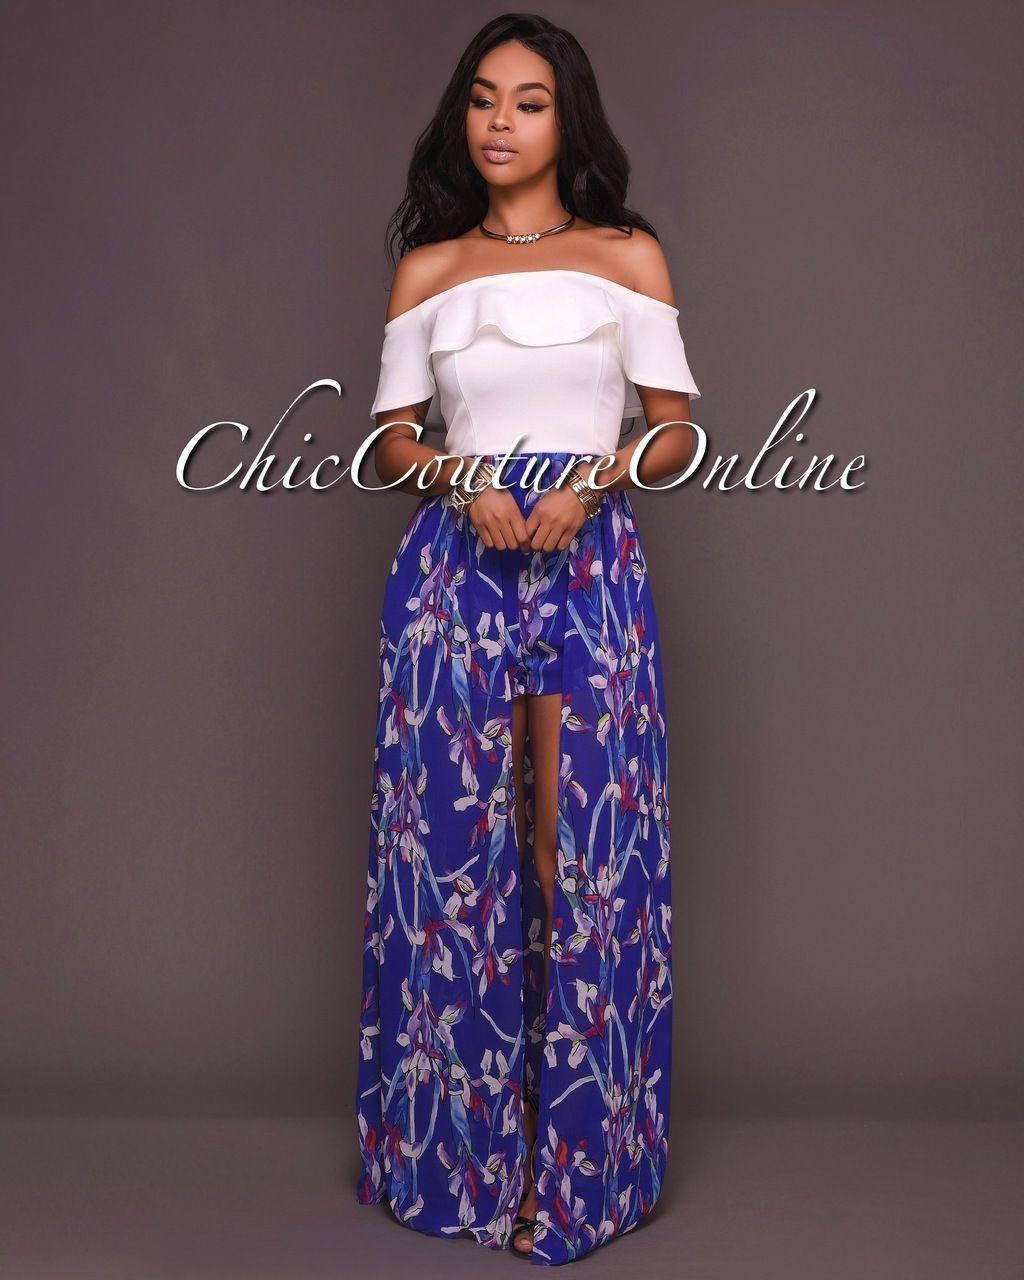 Melika White Blue Floral Print Romper Maxi Dress | Pinterest